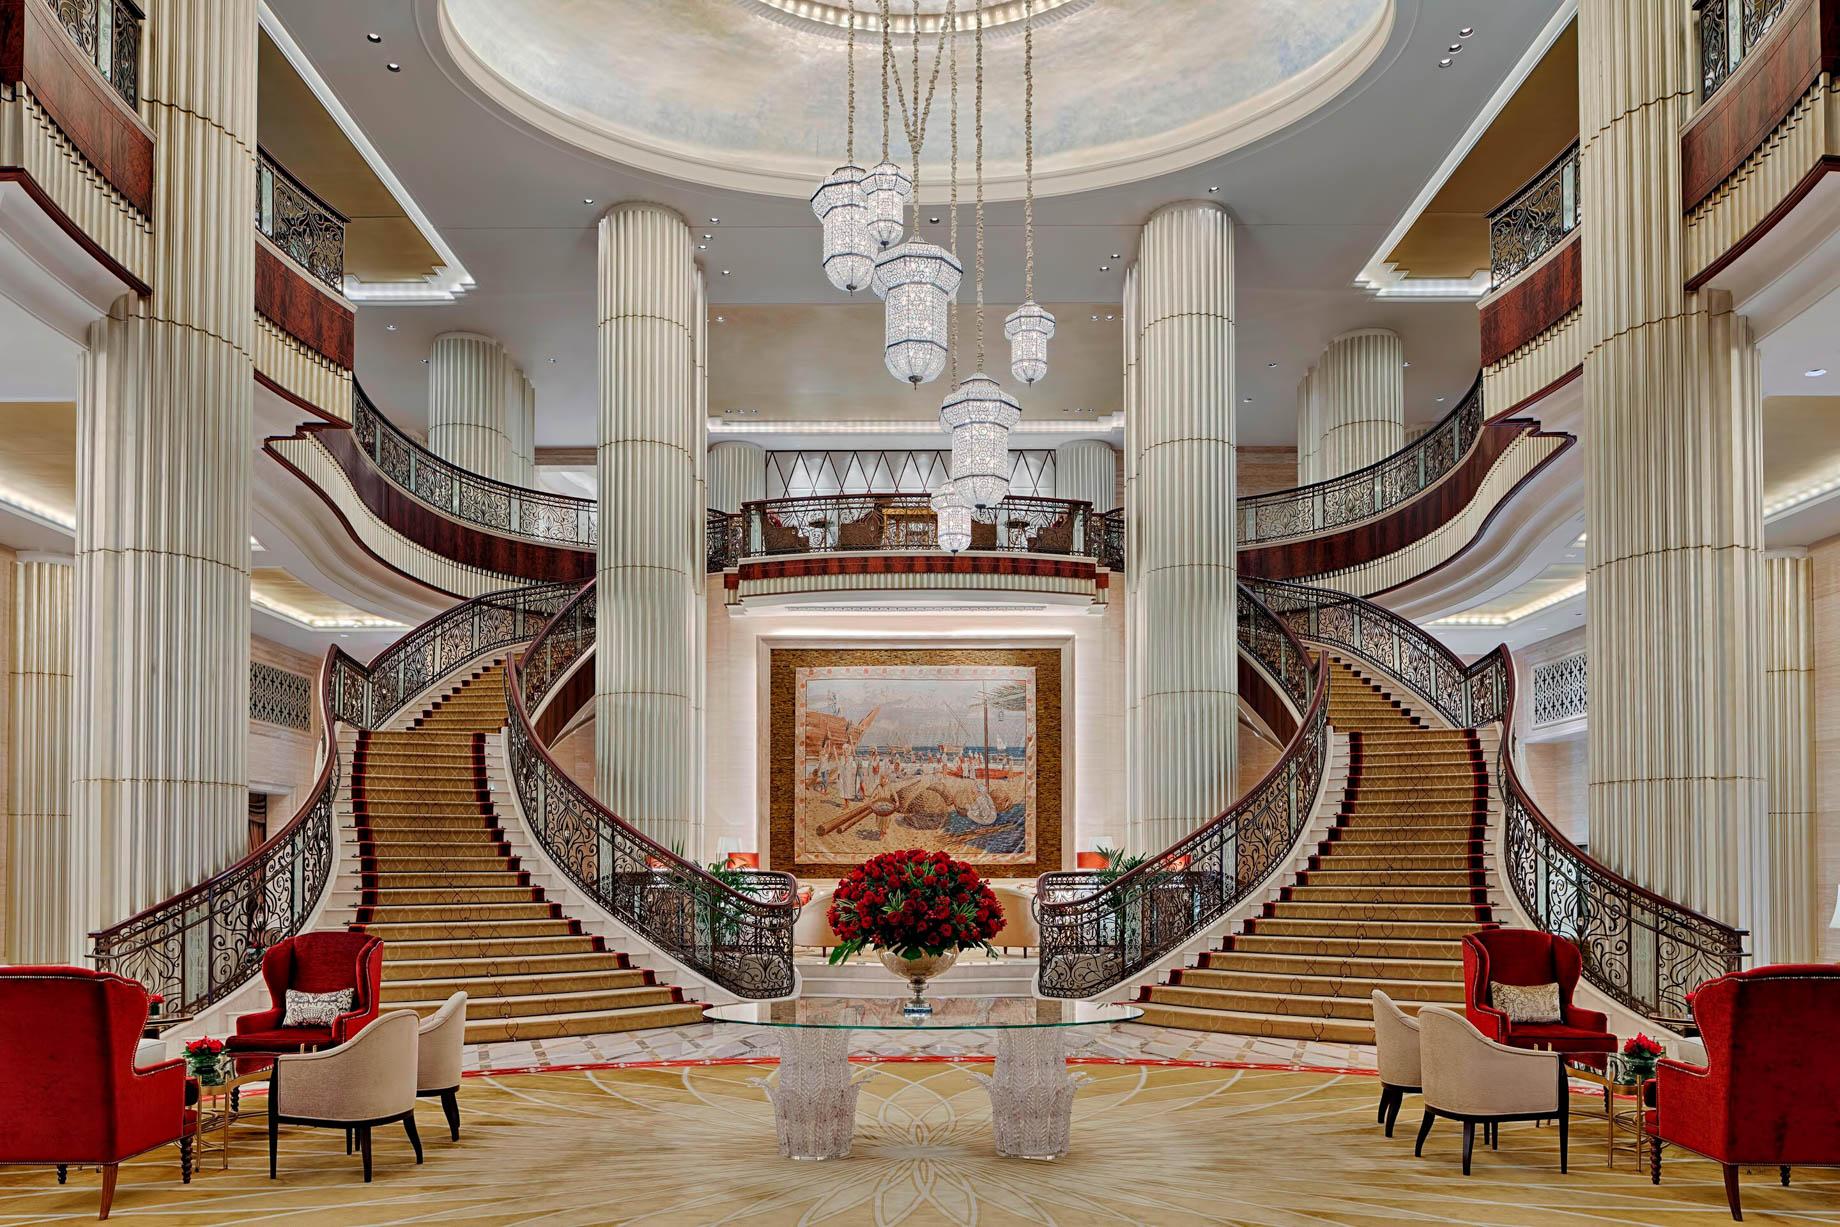 The St. Regis Abu Dhabi Luxury Hotel – Abu Dhabi, United Arab Emirates – Grand Lobby Staircase